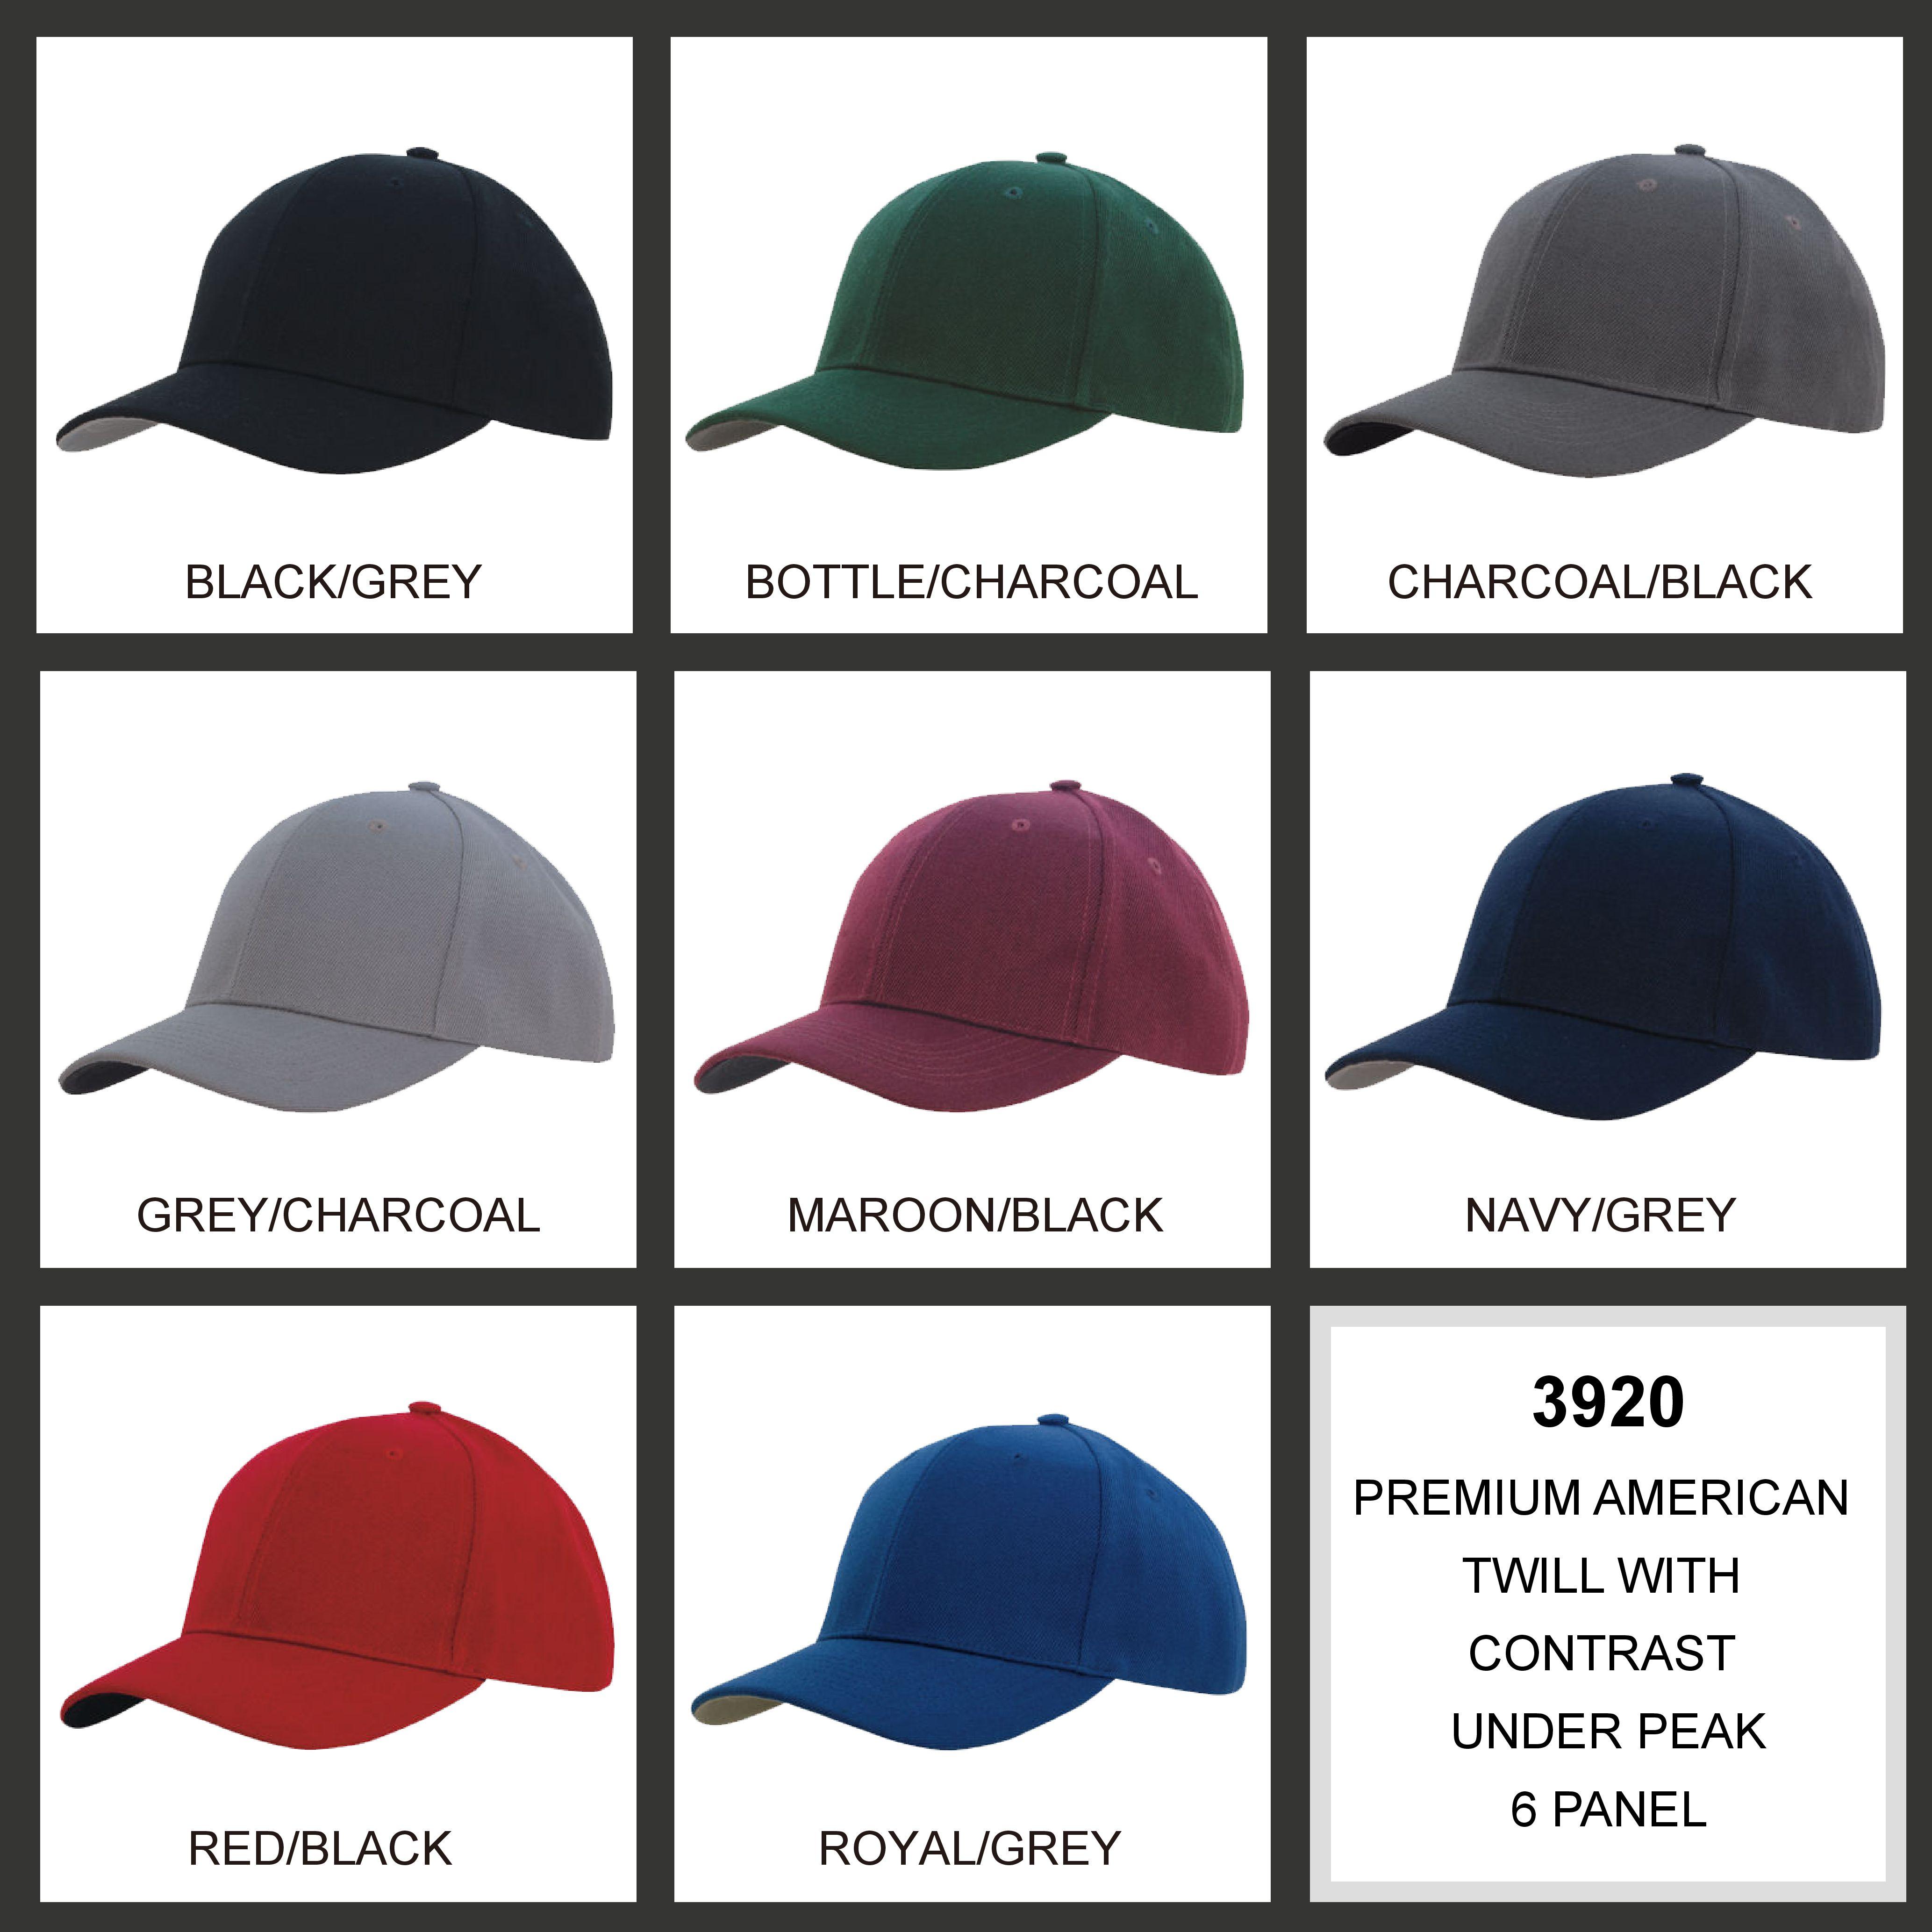 Premium American Twill with Contrast Peak Under (3920) 2 | | Promotion Wear